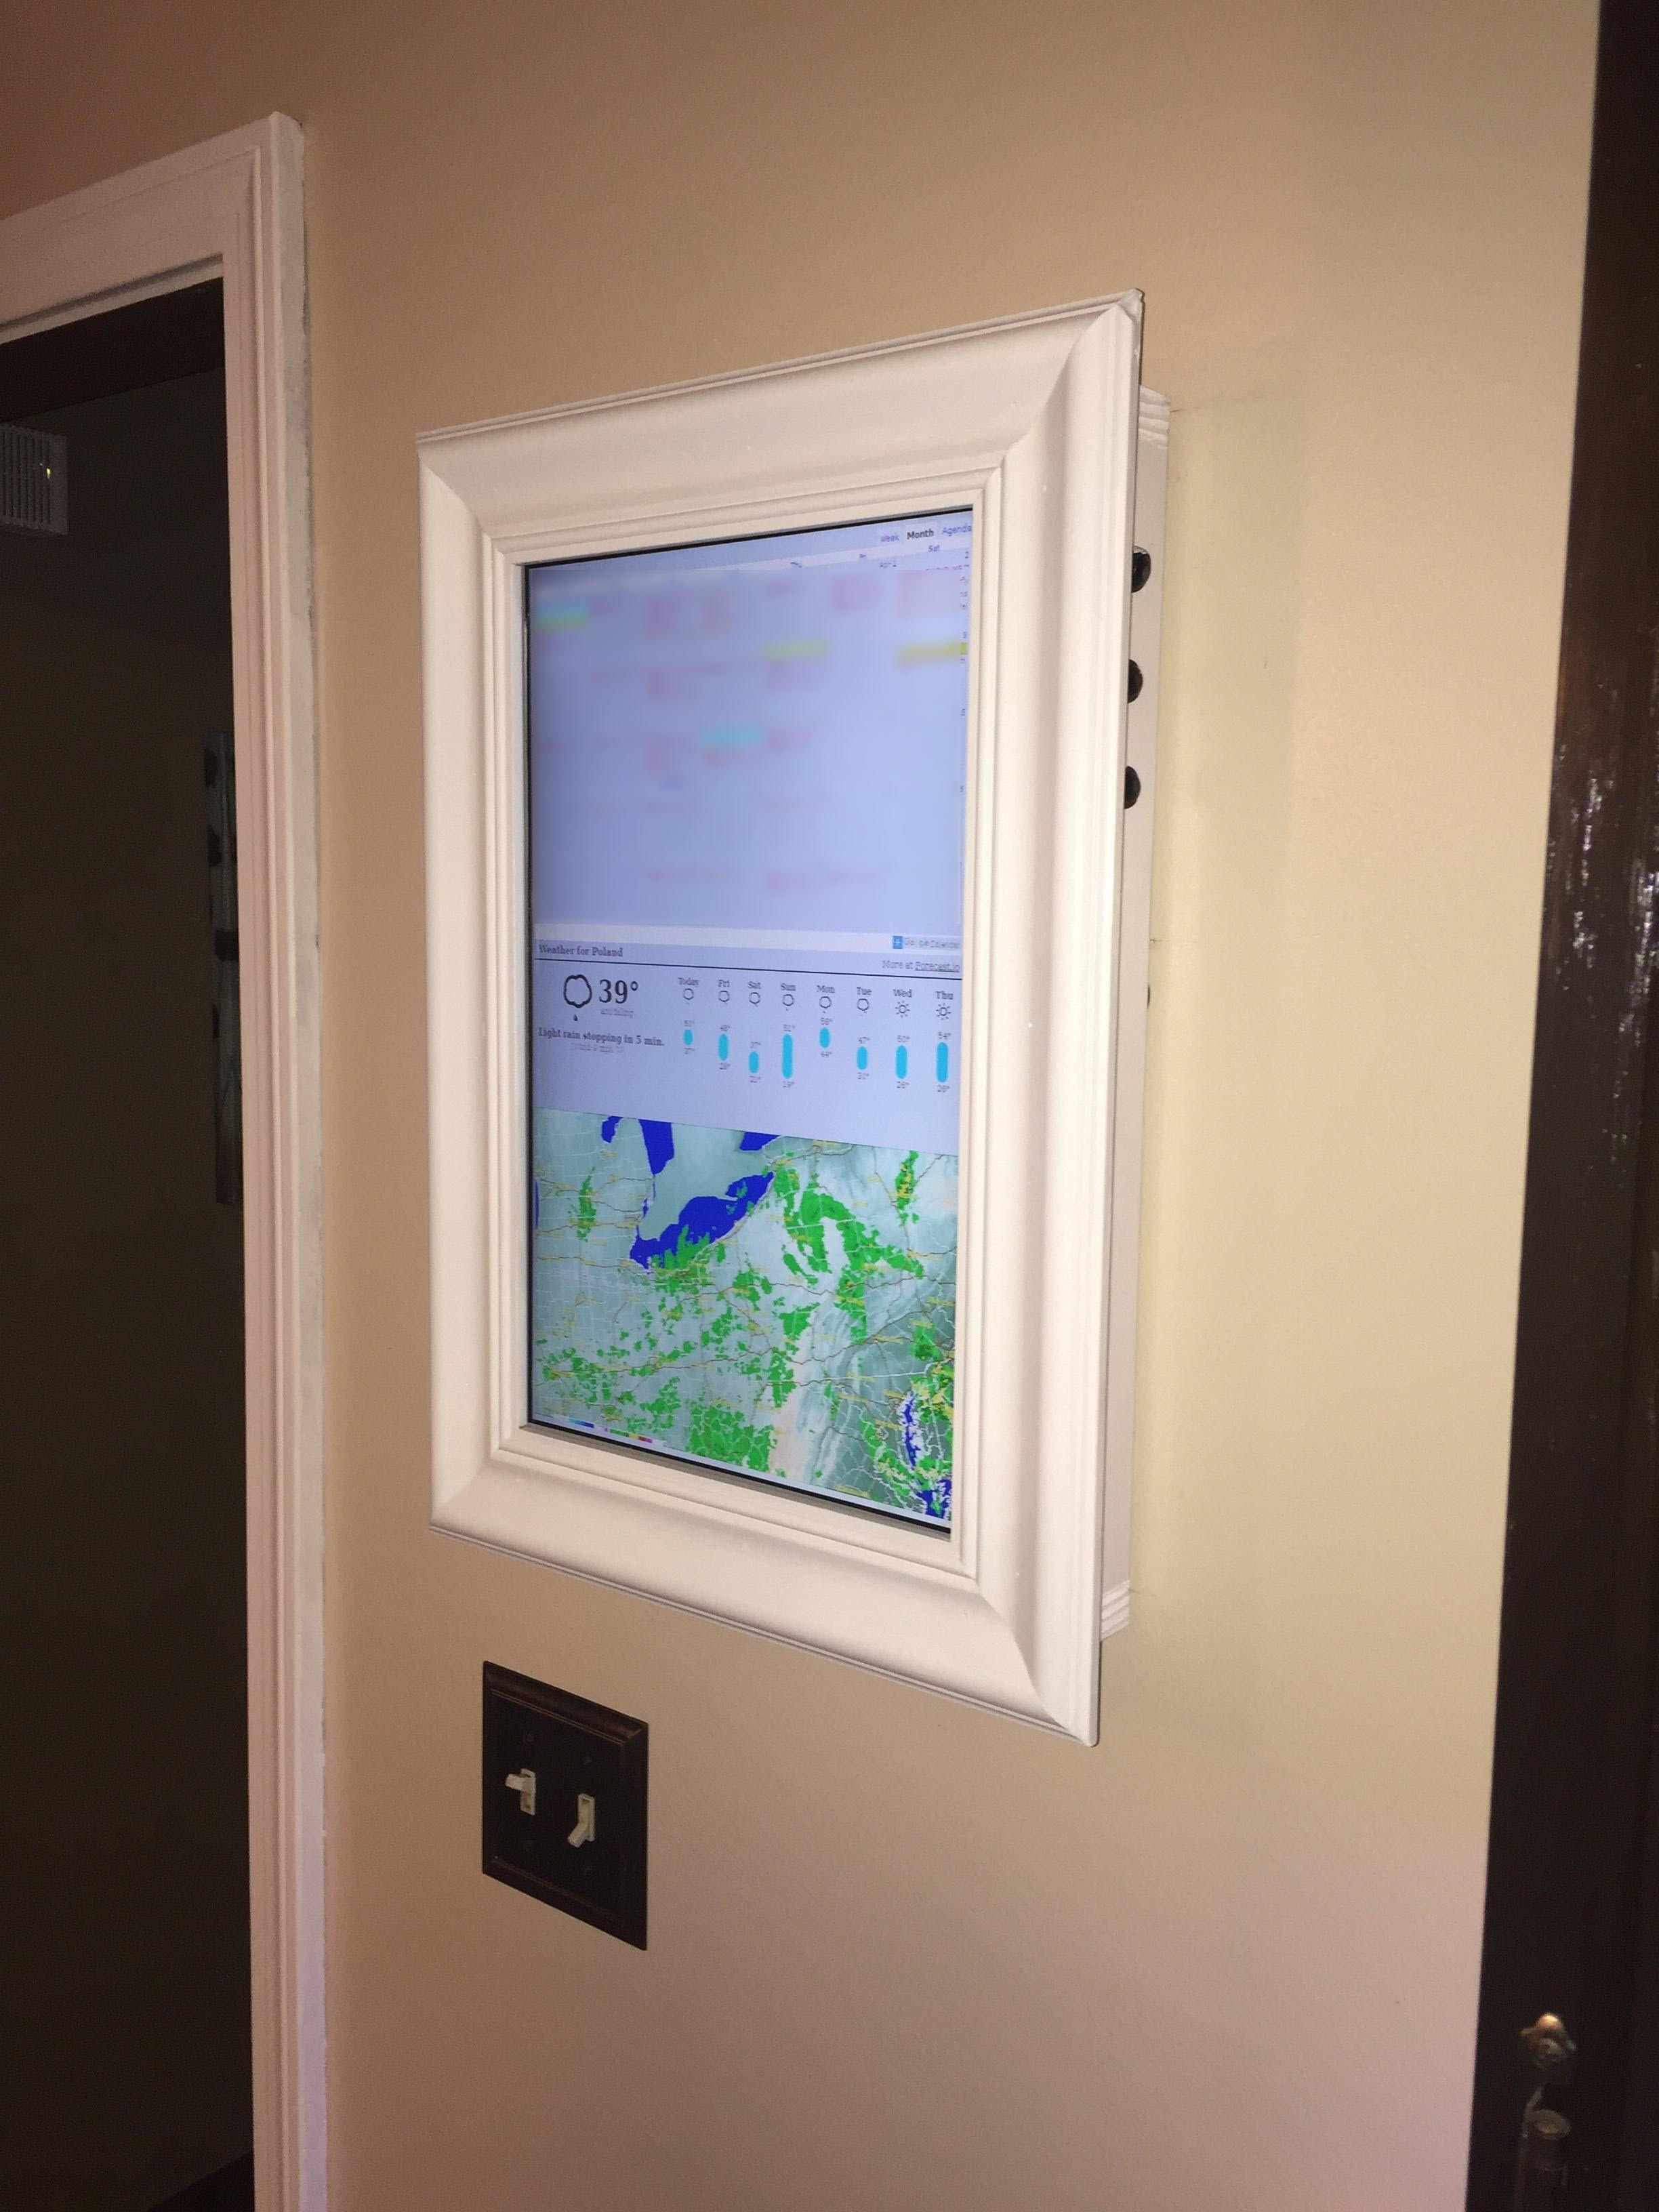 Raspberry Pi Framed Informational Display Google